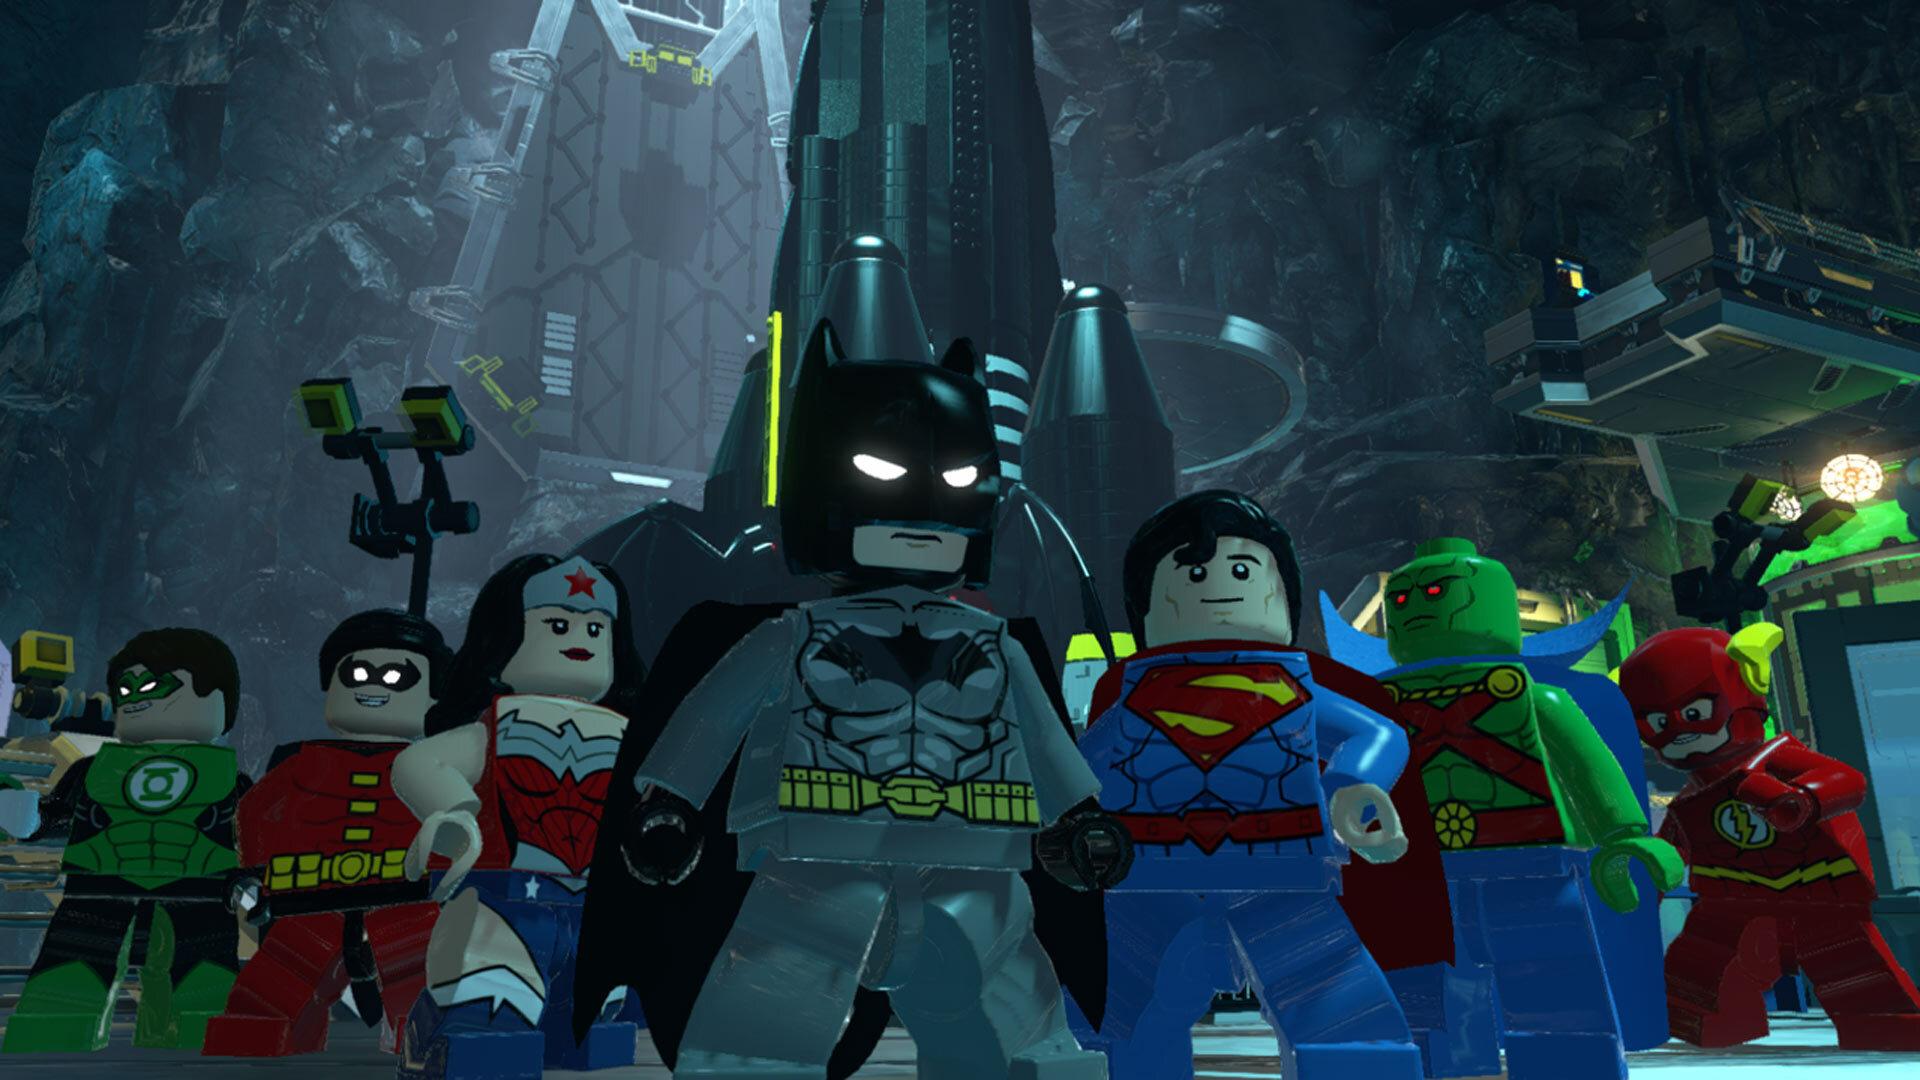 lego-batman-3-beyond-gotham-pc-screenshot-03